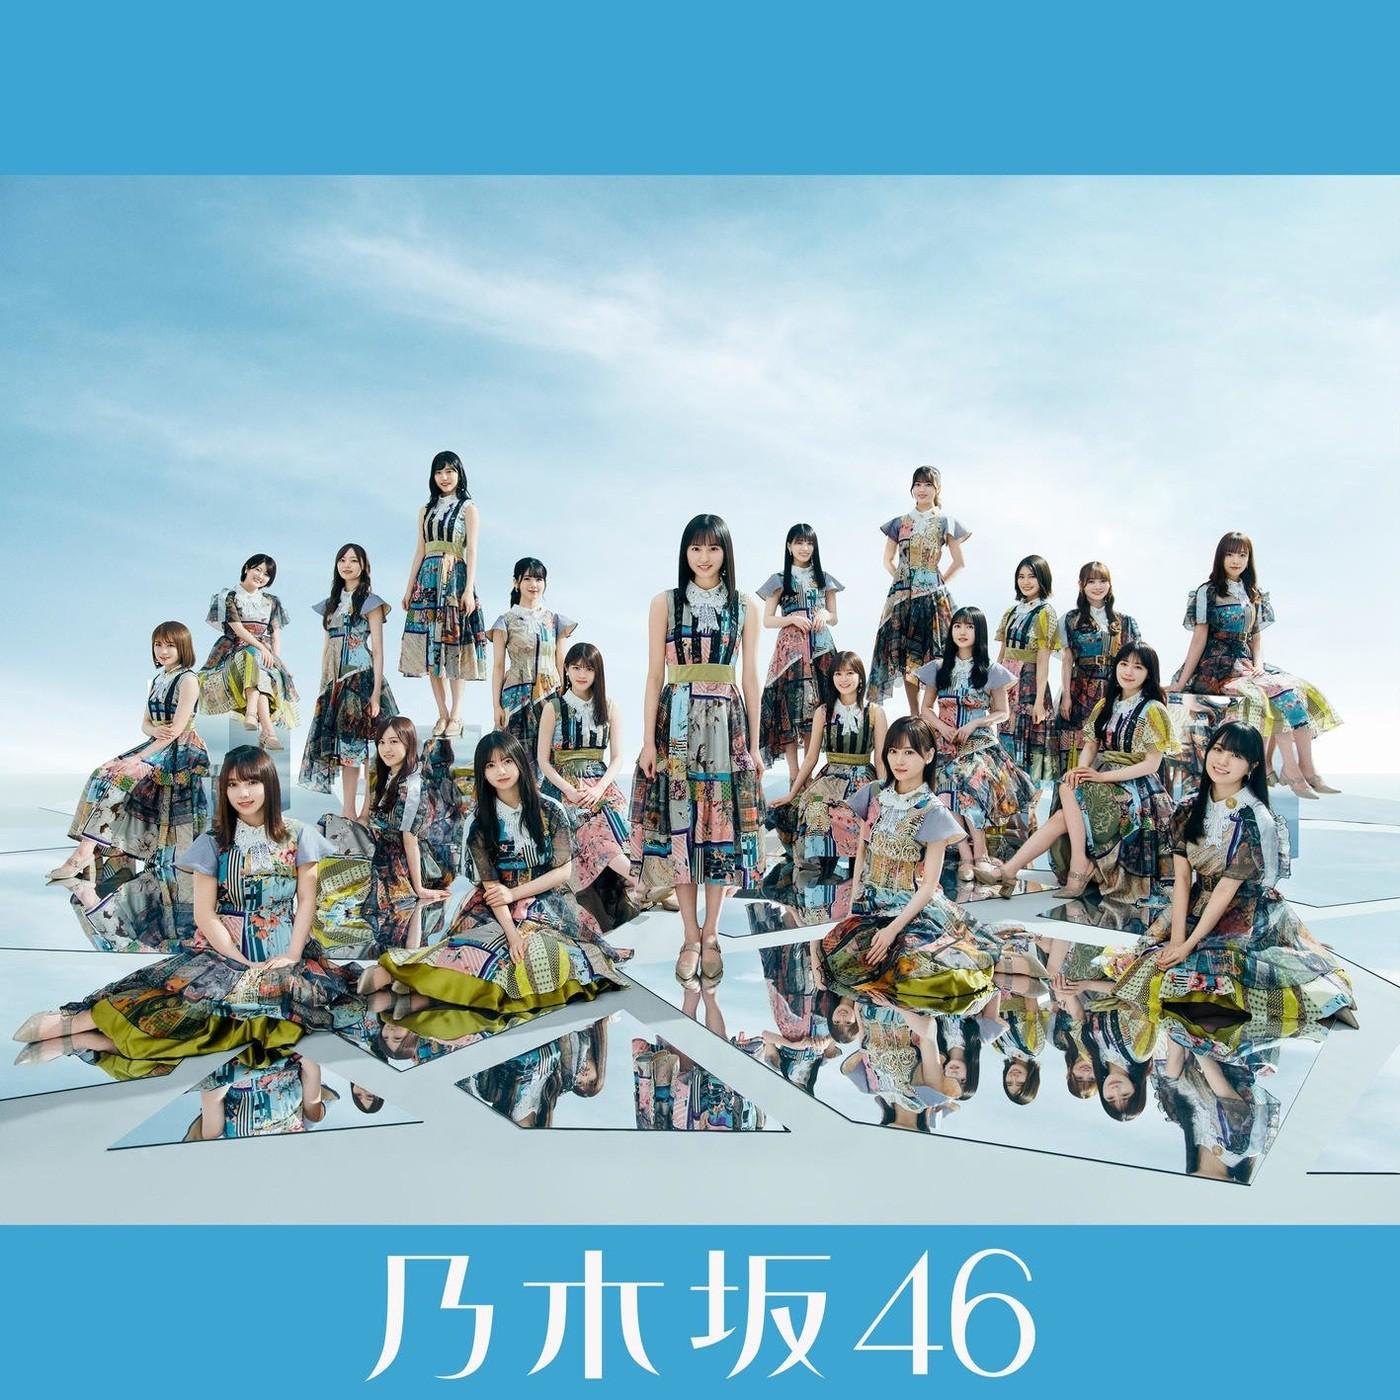 [Album] 乃木坂46 (Nogizaka46) – ごめんねFingers crossed (Special Edition) [FLAC + MP3 320 / WEB] [2021.06.09]